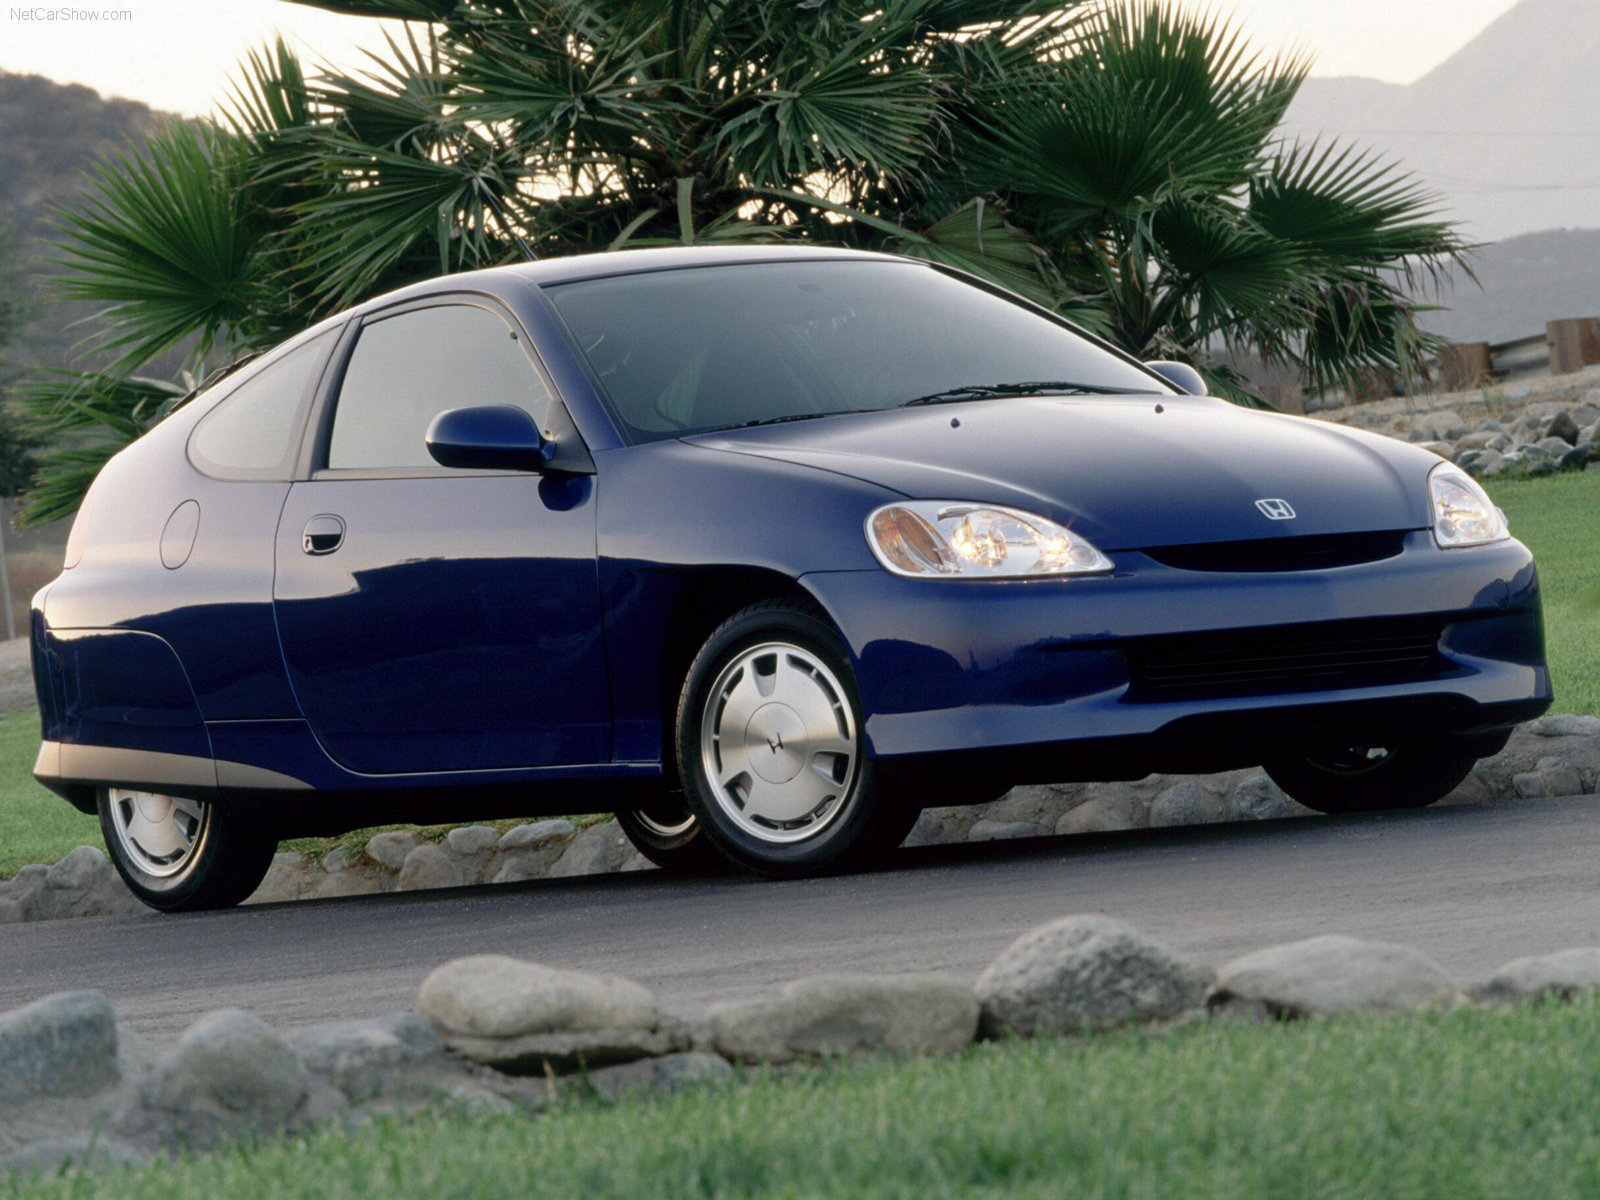 2000 Honda Insight Front 3/4